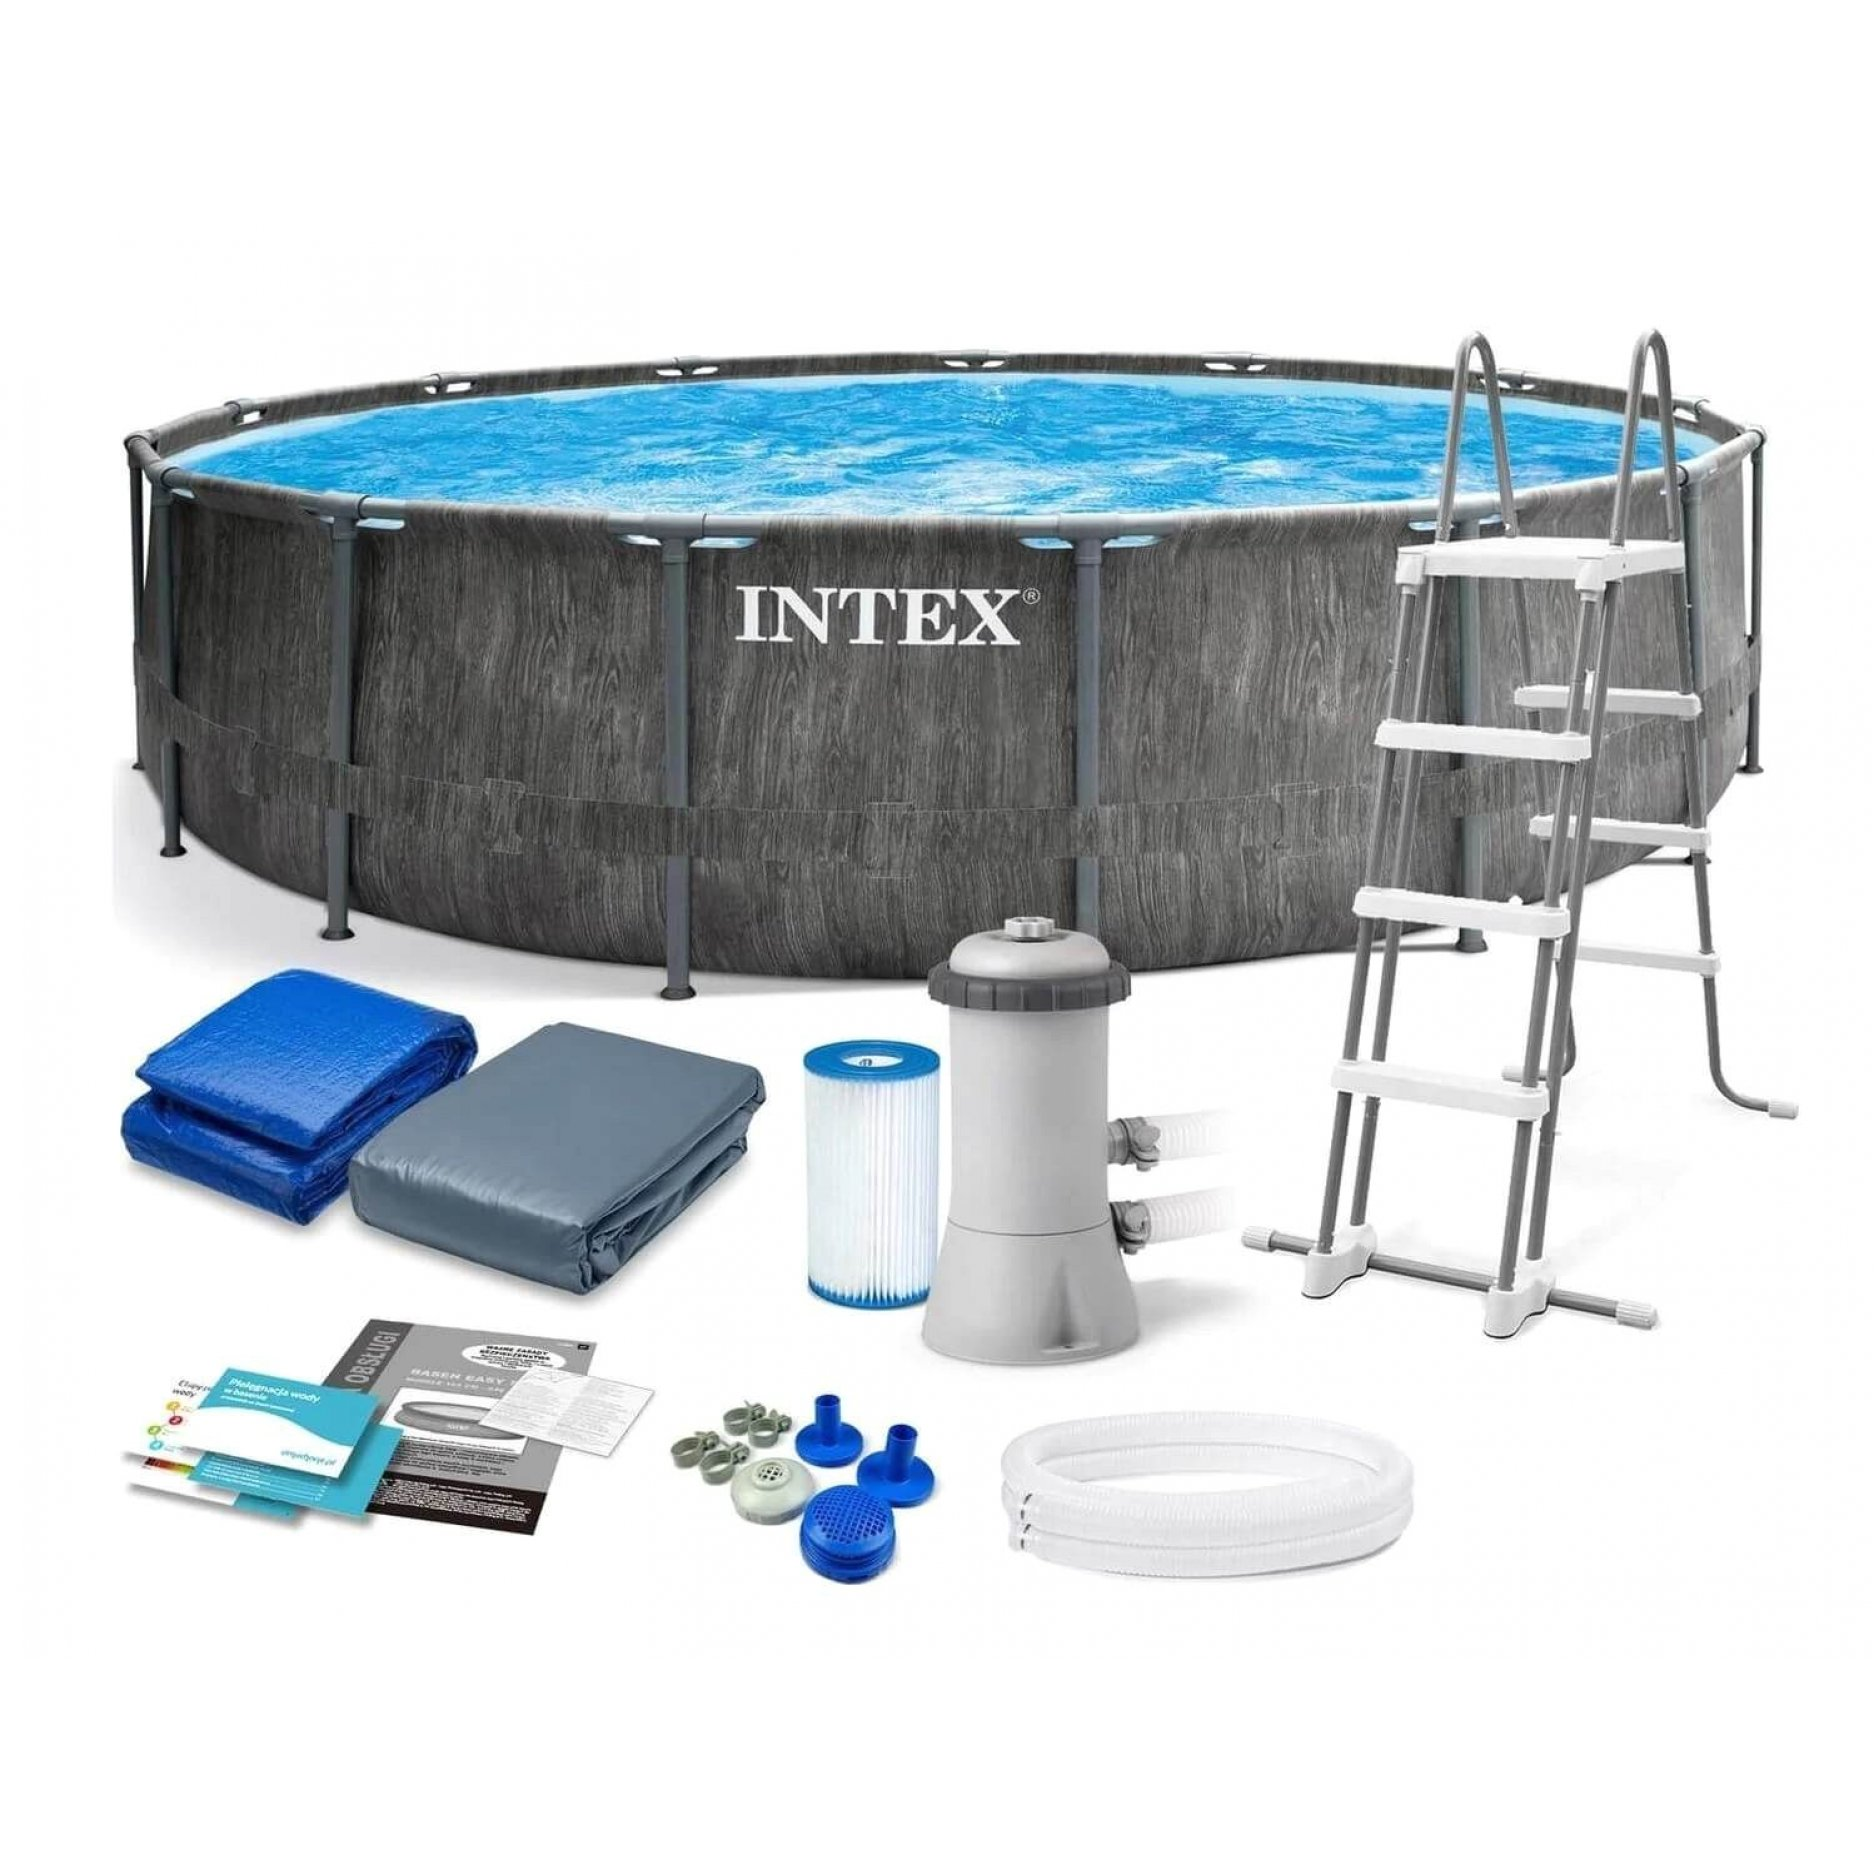 Каркасный бассейн INTEX Prism Frame Premium 4.57 х 1.22 м